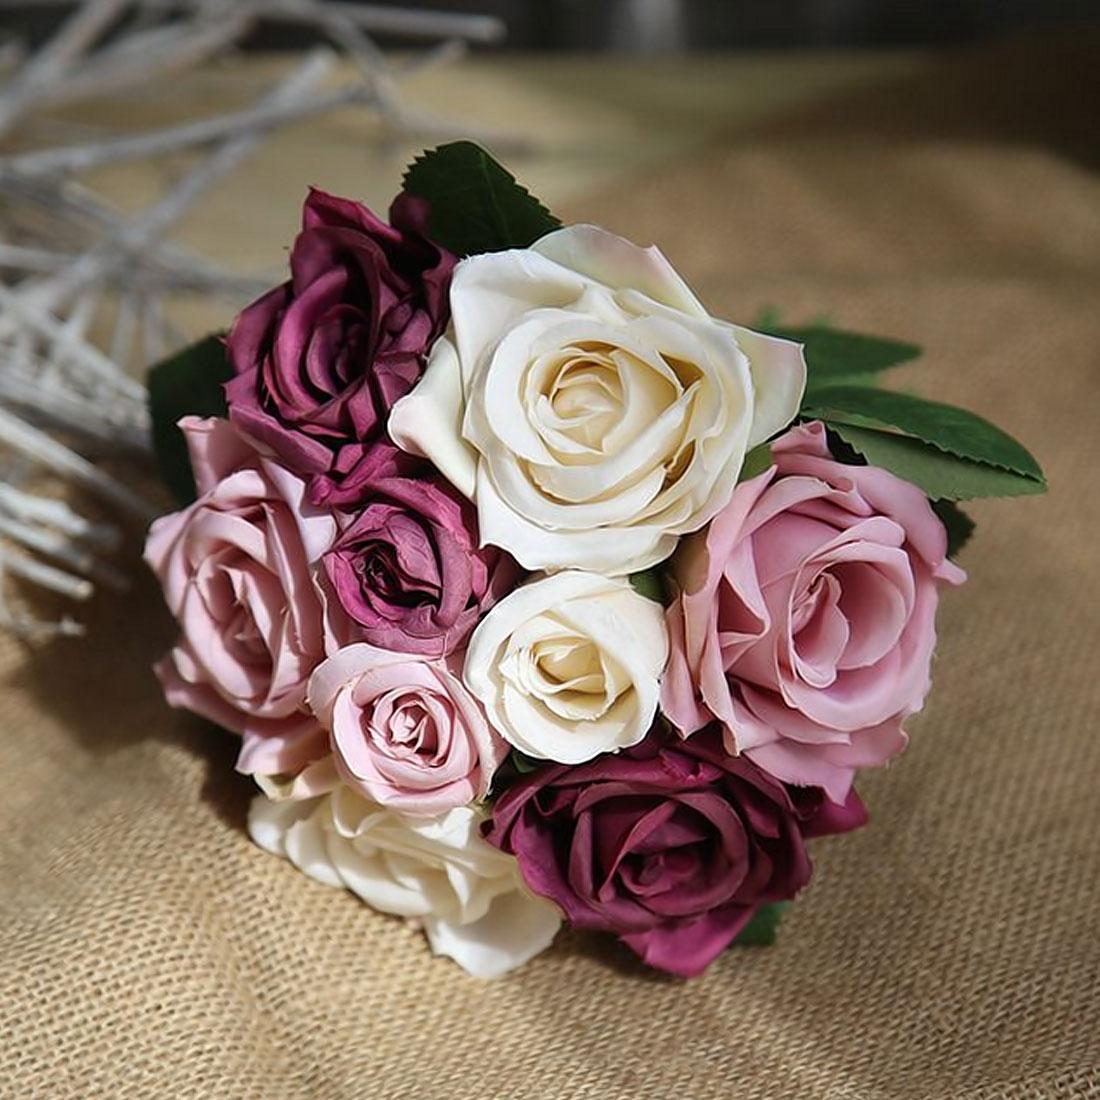 Top Quality 9pcs Rose flowers banquet Thai Royal Rose wedding decoration artificial flowers Faux silk flower roses home decor